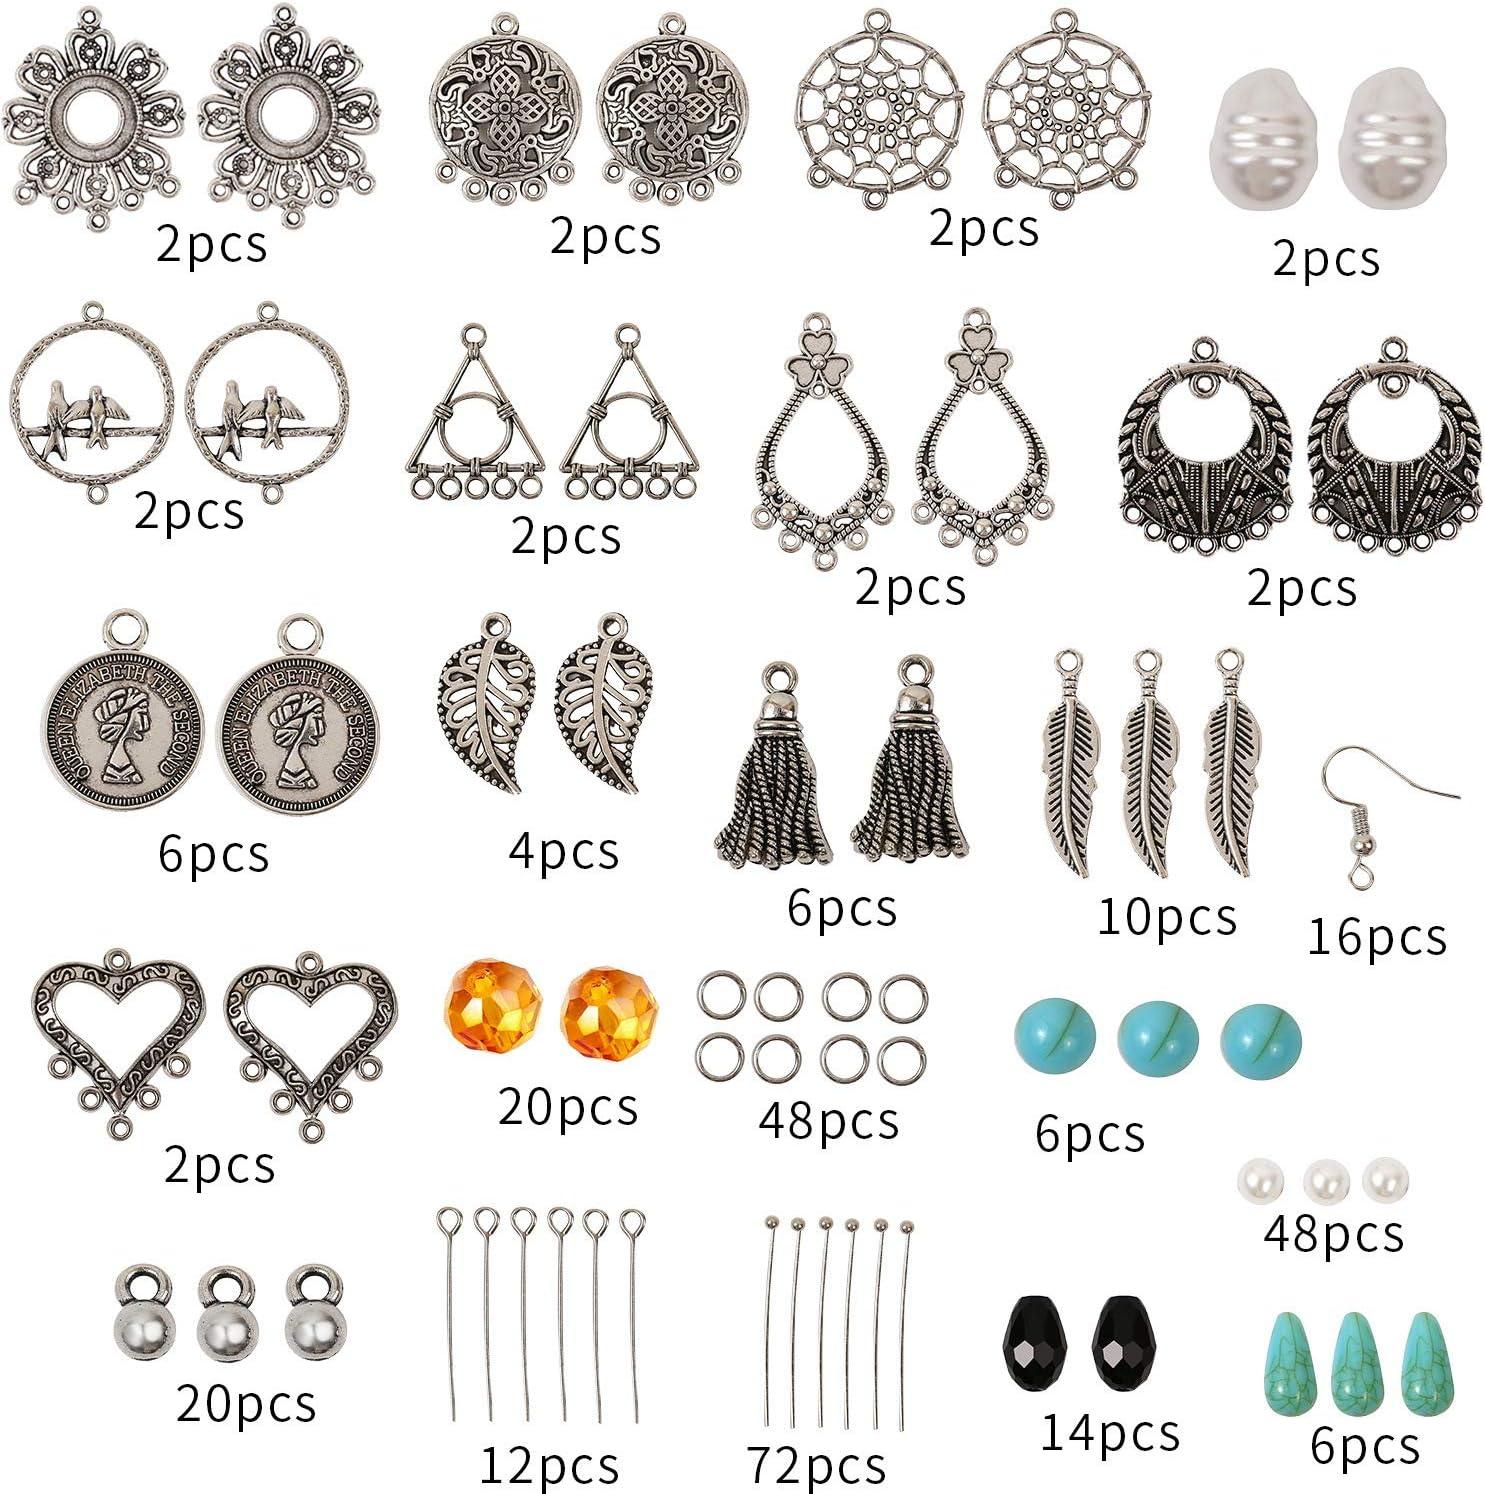 A Jewelry Making Supplies Kit Handmade Earrings DIY Making Set Jewelry Making and Repair Tool for Beginners